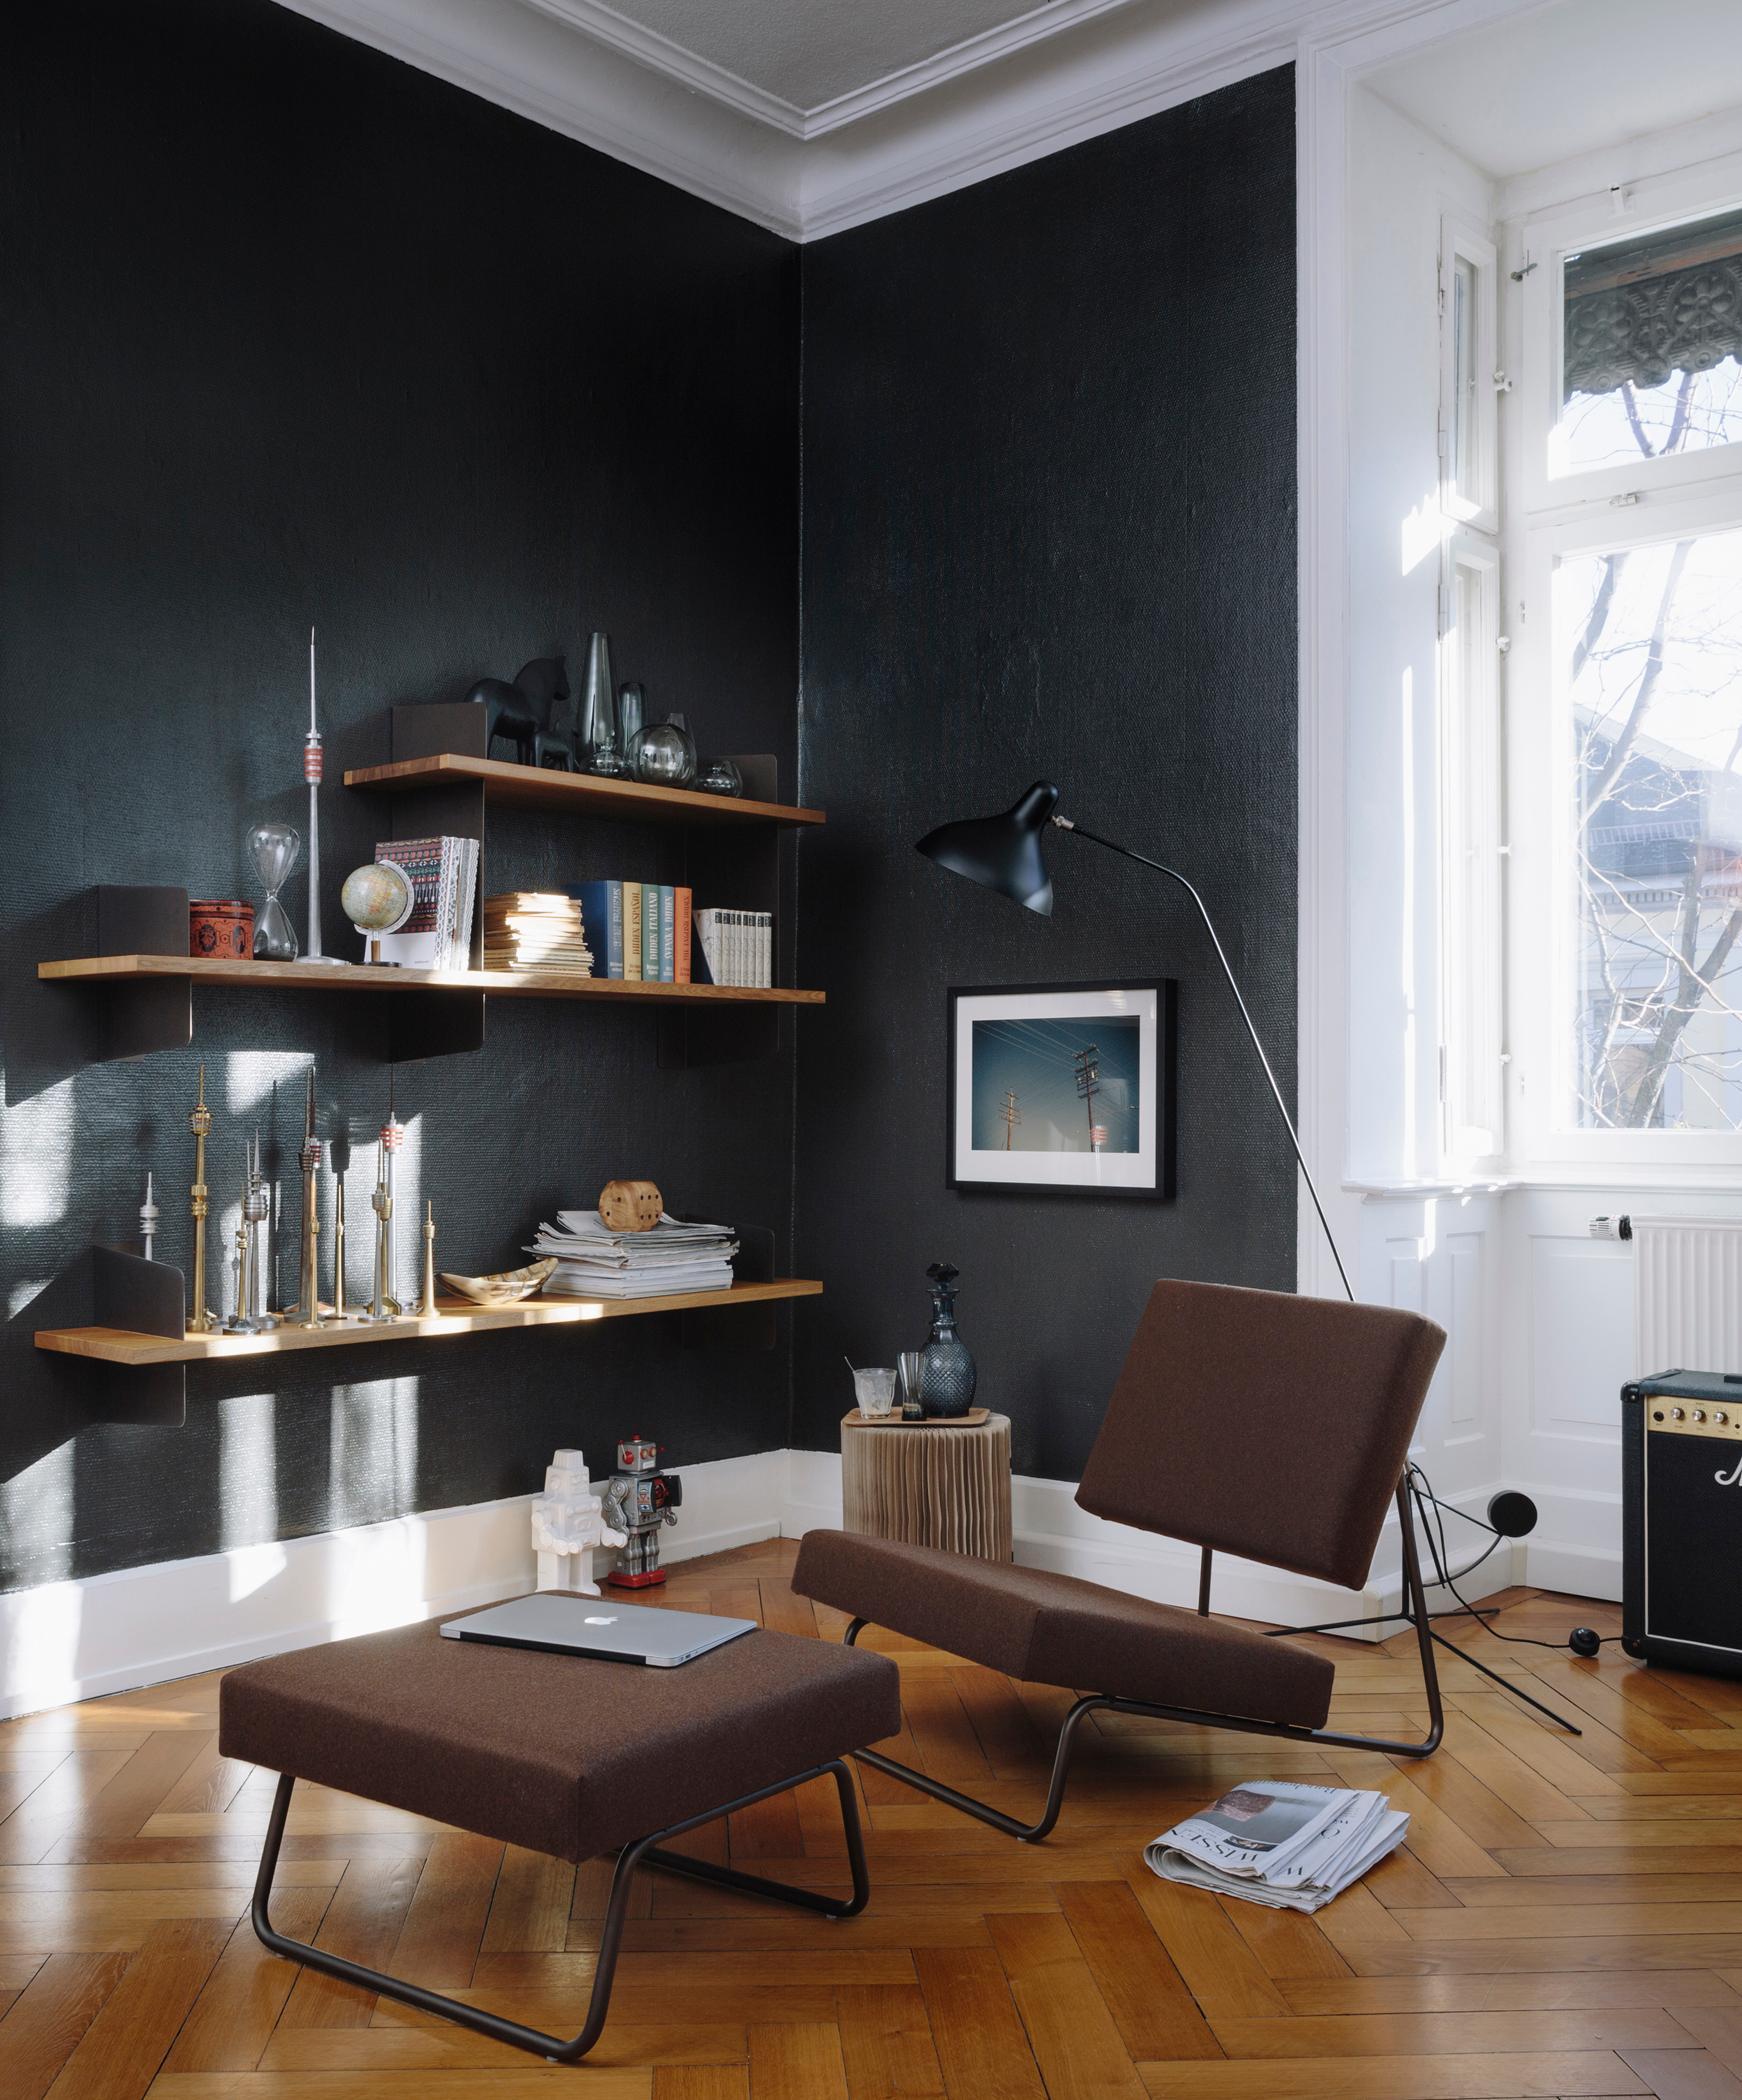 schwarze wandfarbe bilder ideen couchstyle. Black Bedroom Furniture Sets. Home Design Ideas